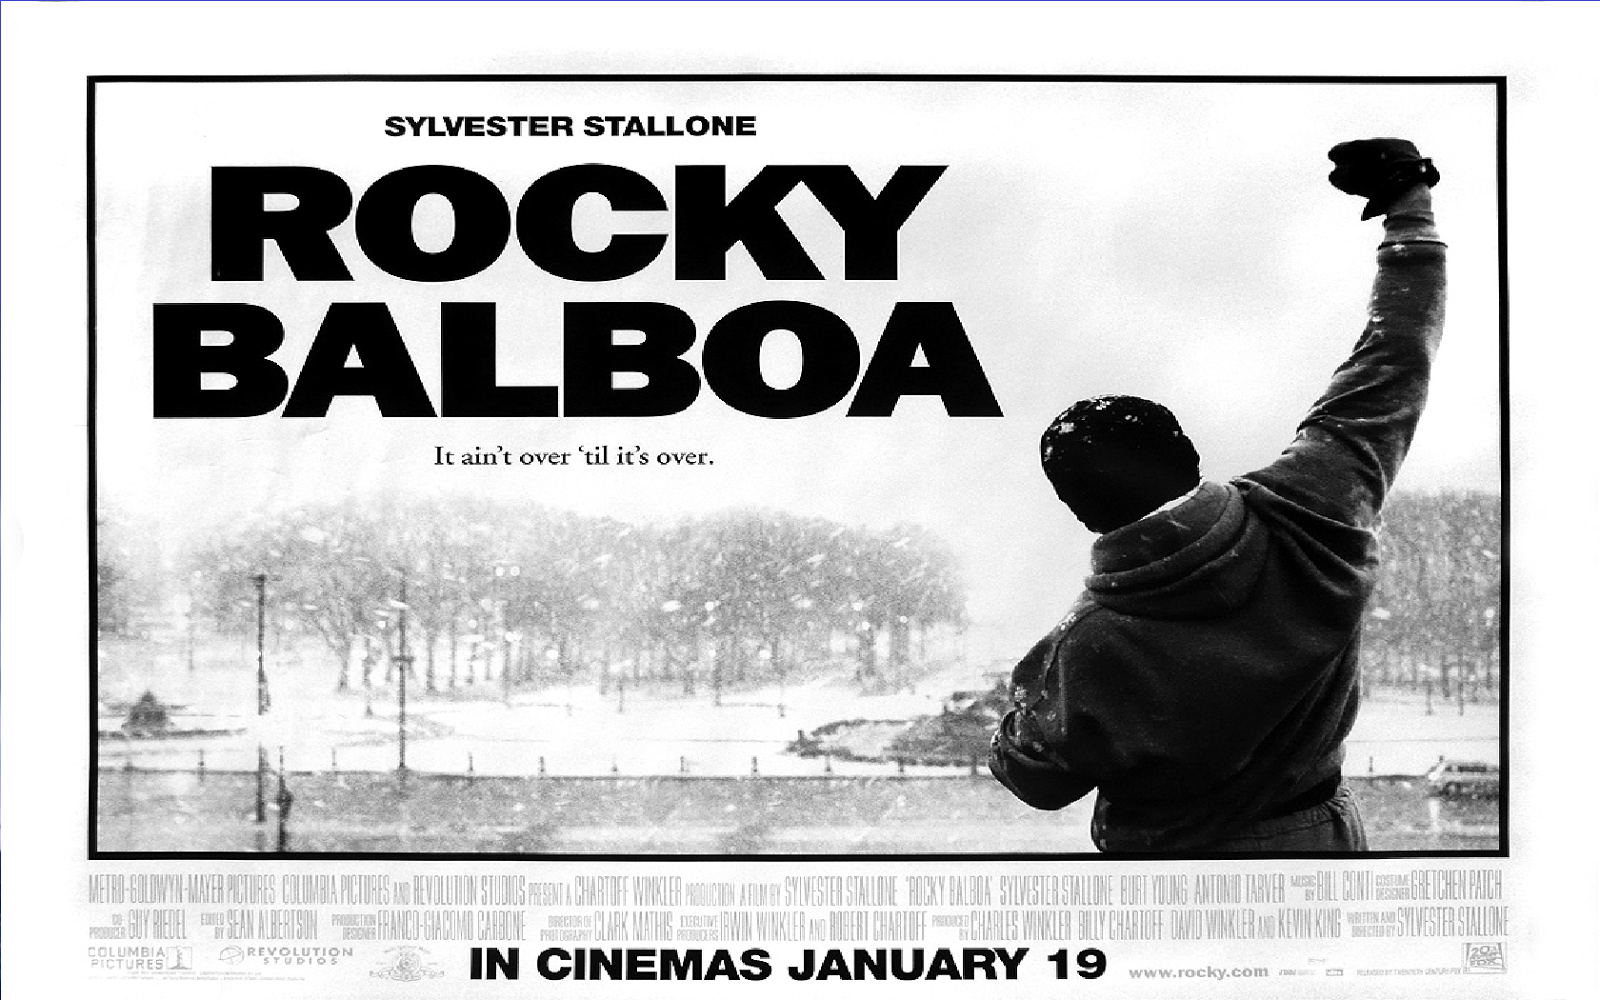 rocky balboa coloring pages - noviembre 2016 duncan jacques